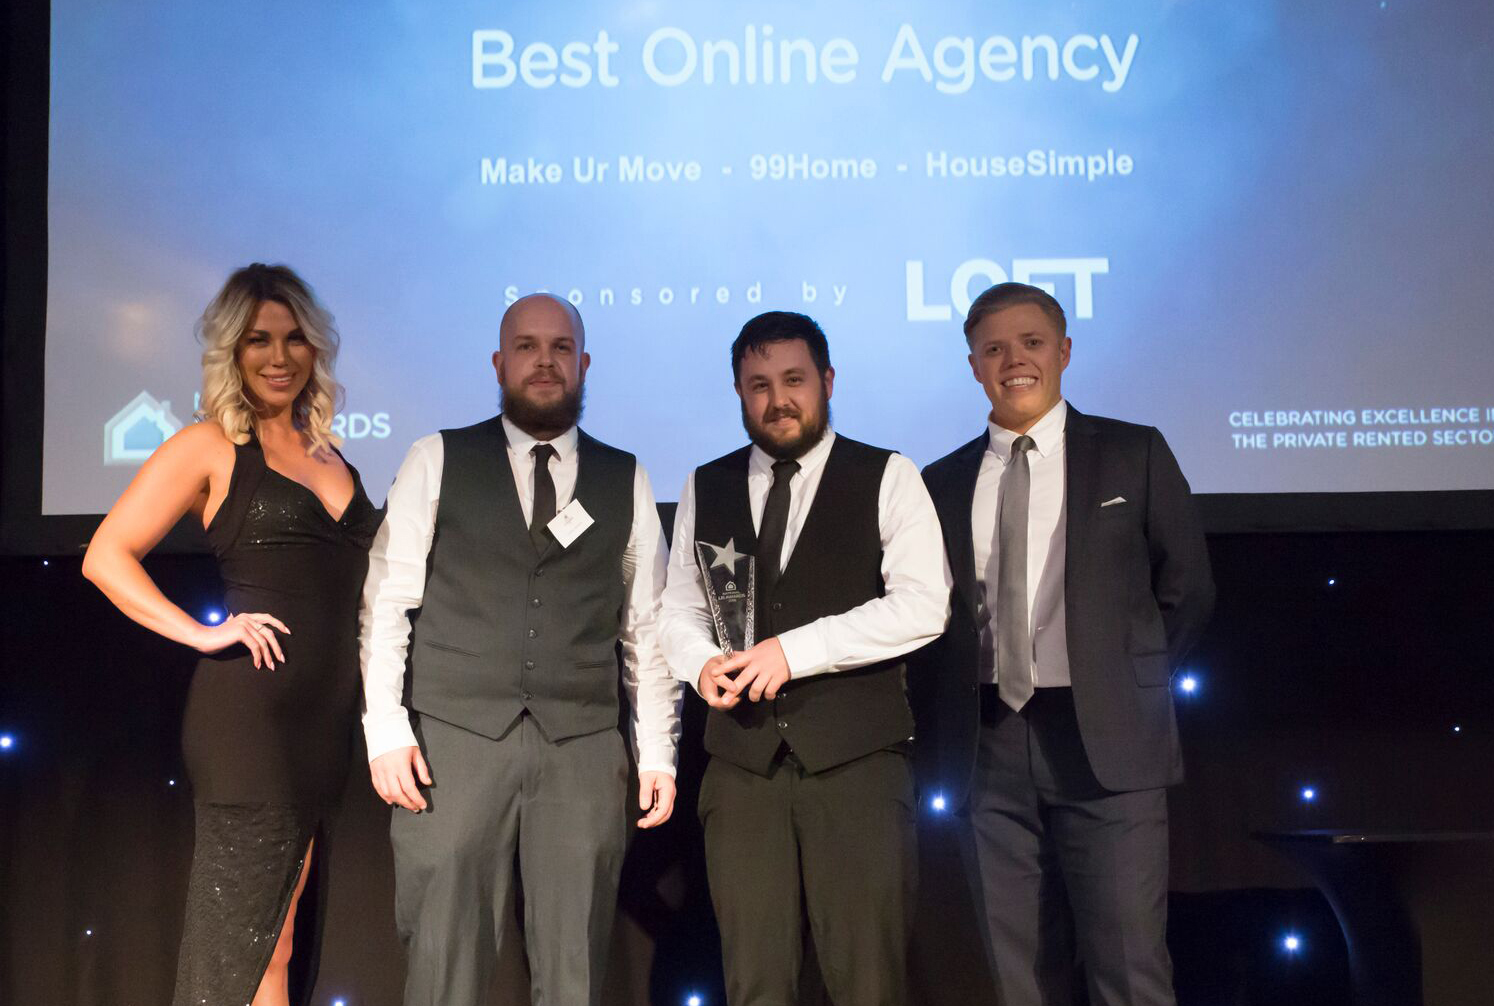 best online agency.jpg